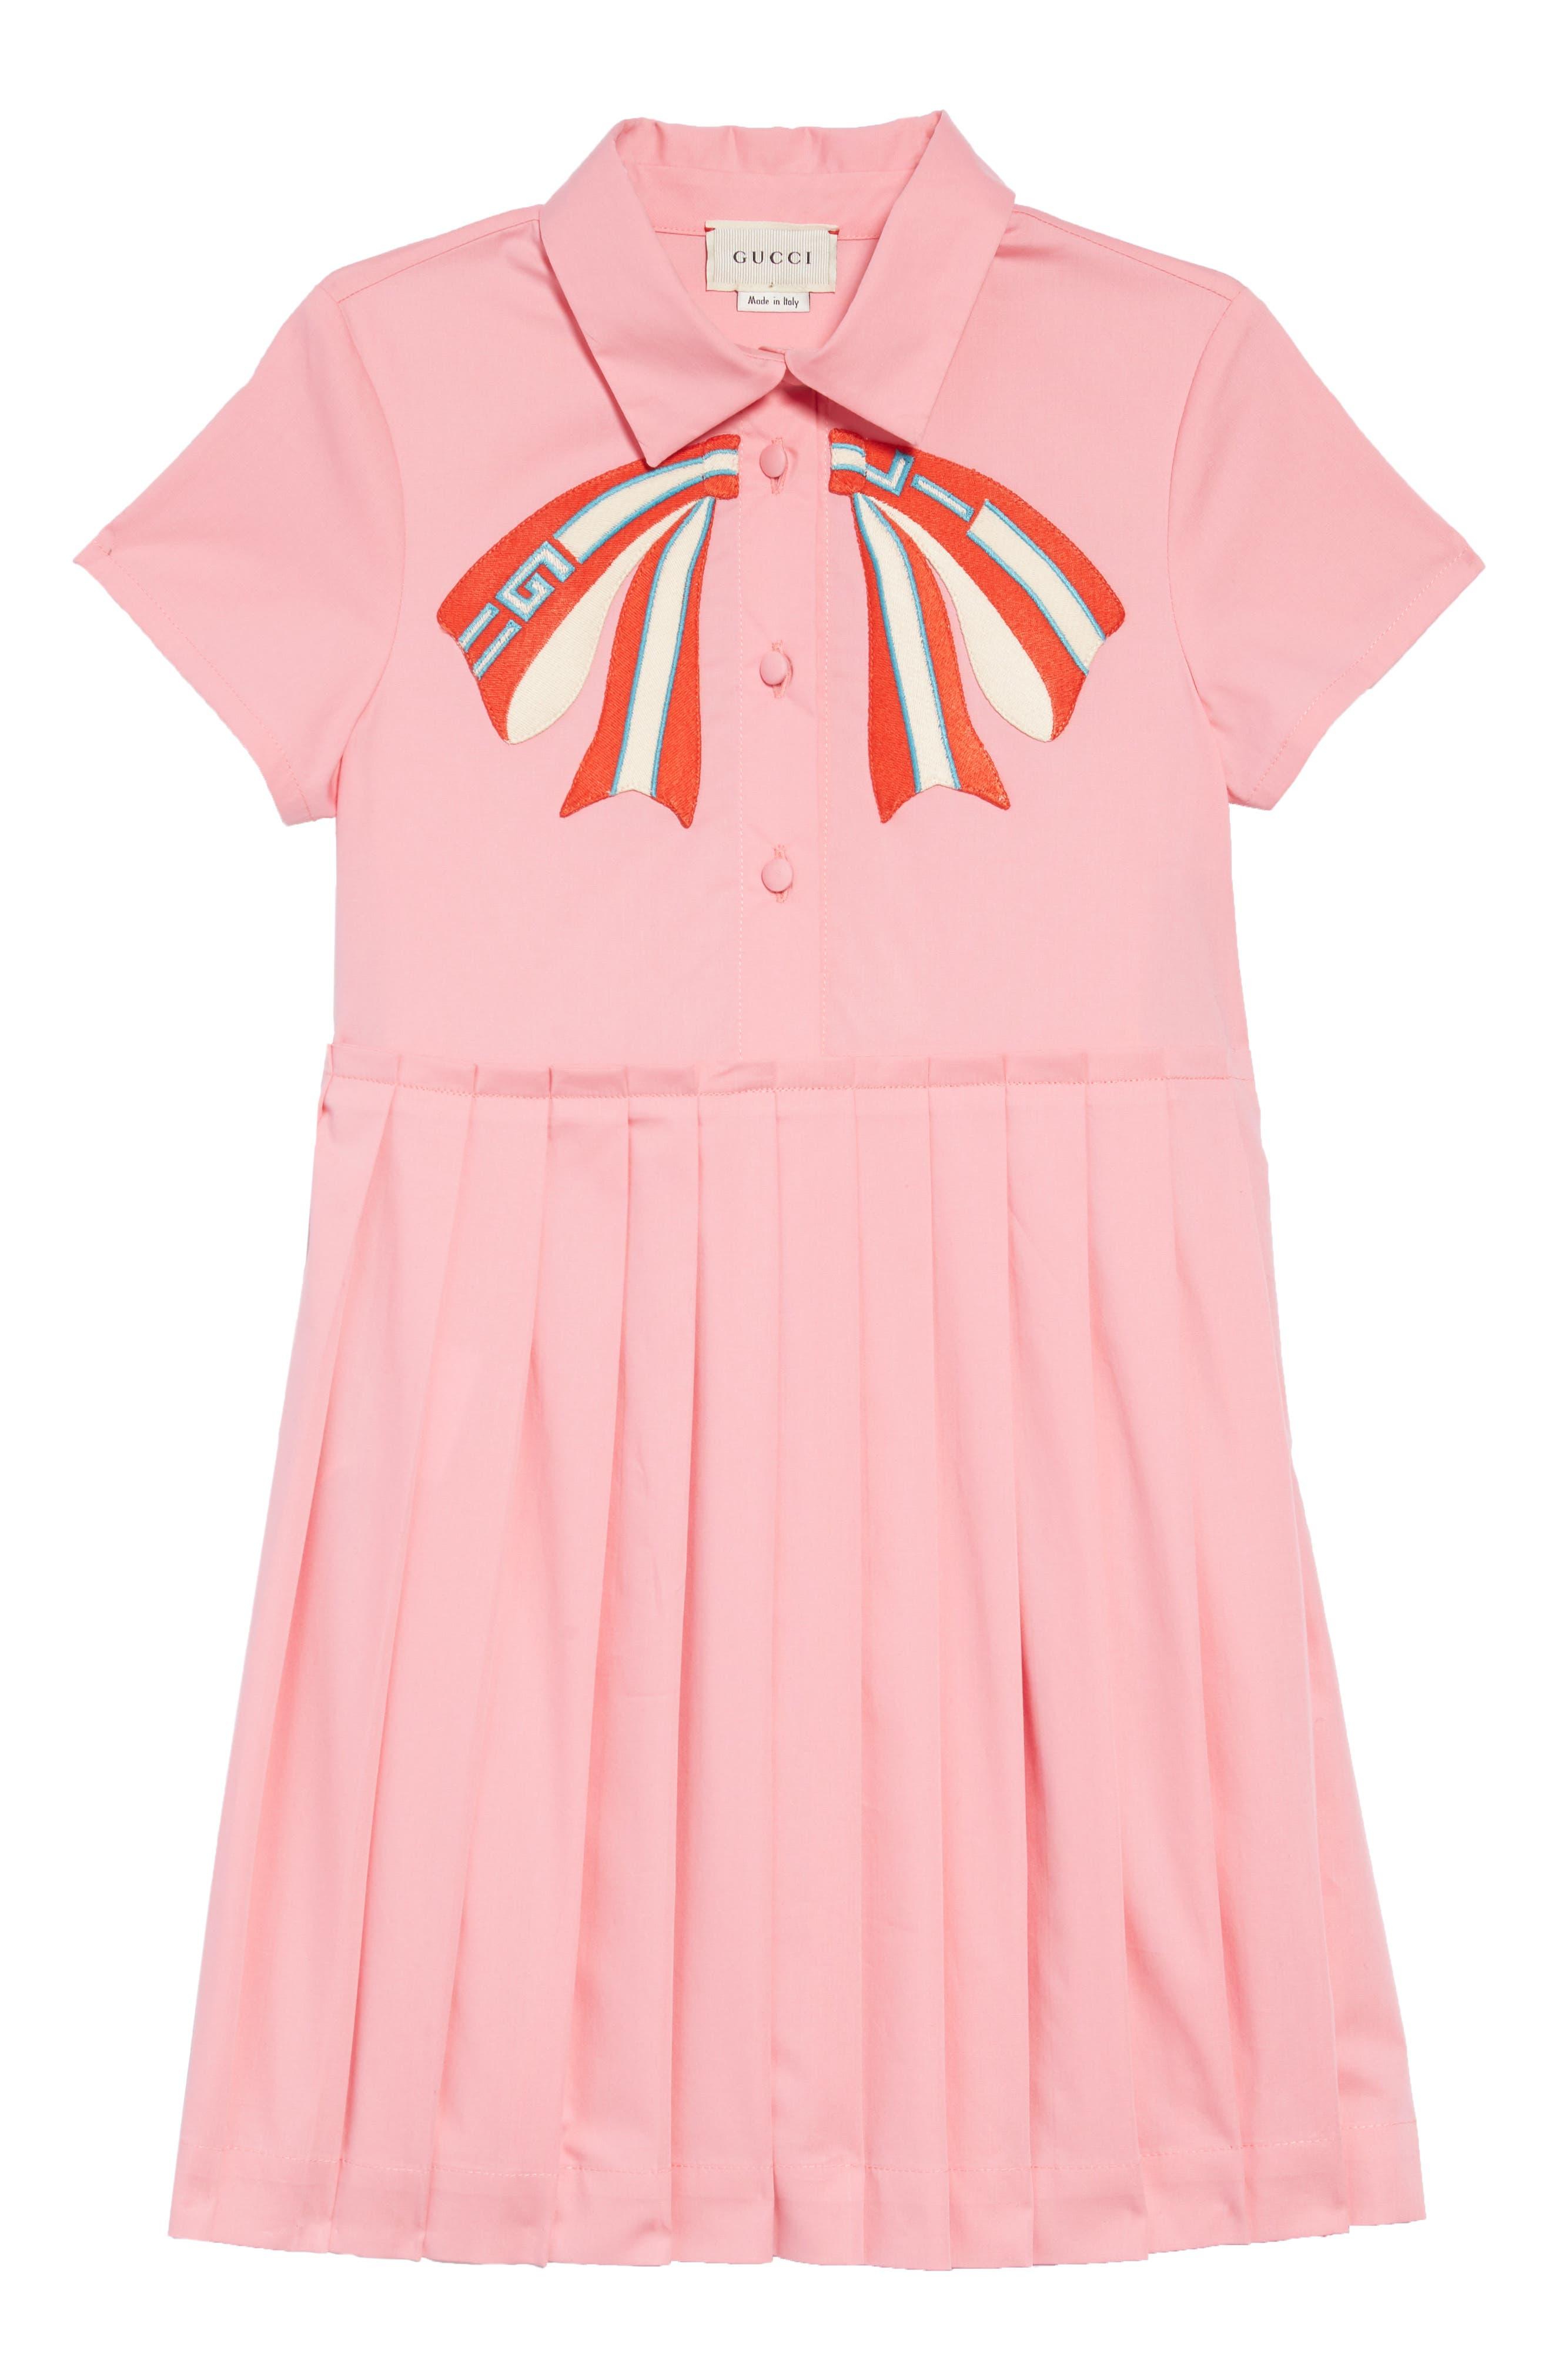 a55a8925d5dc0 Gucci Kids - Girls Dresses